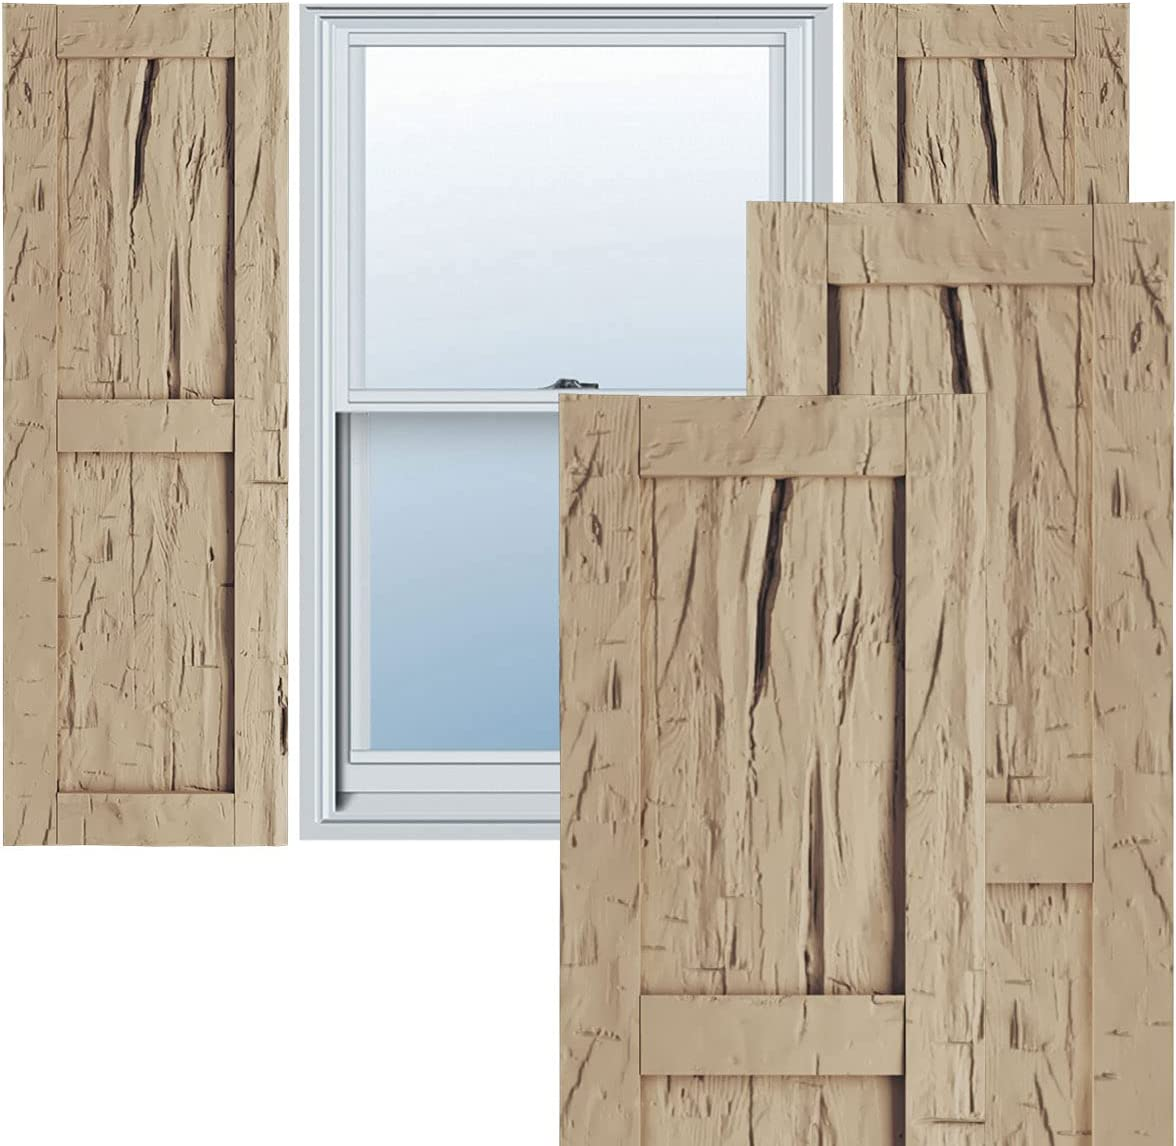 Ekena Millwork SHULVRW Faux Max 59% OFF Wood Per Shutters Ranking TOP15 Pair Two Rustic